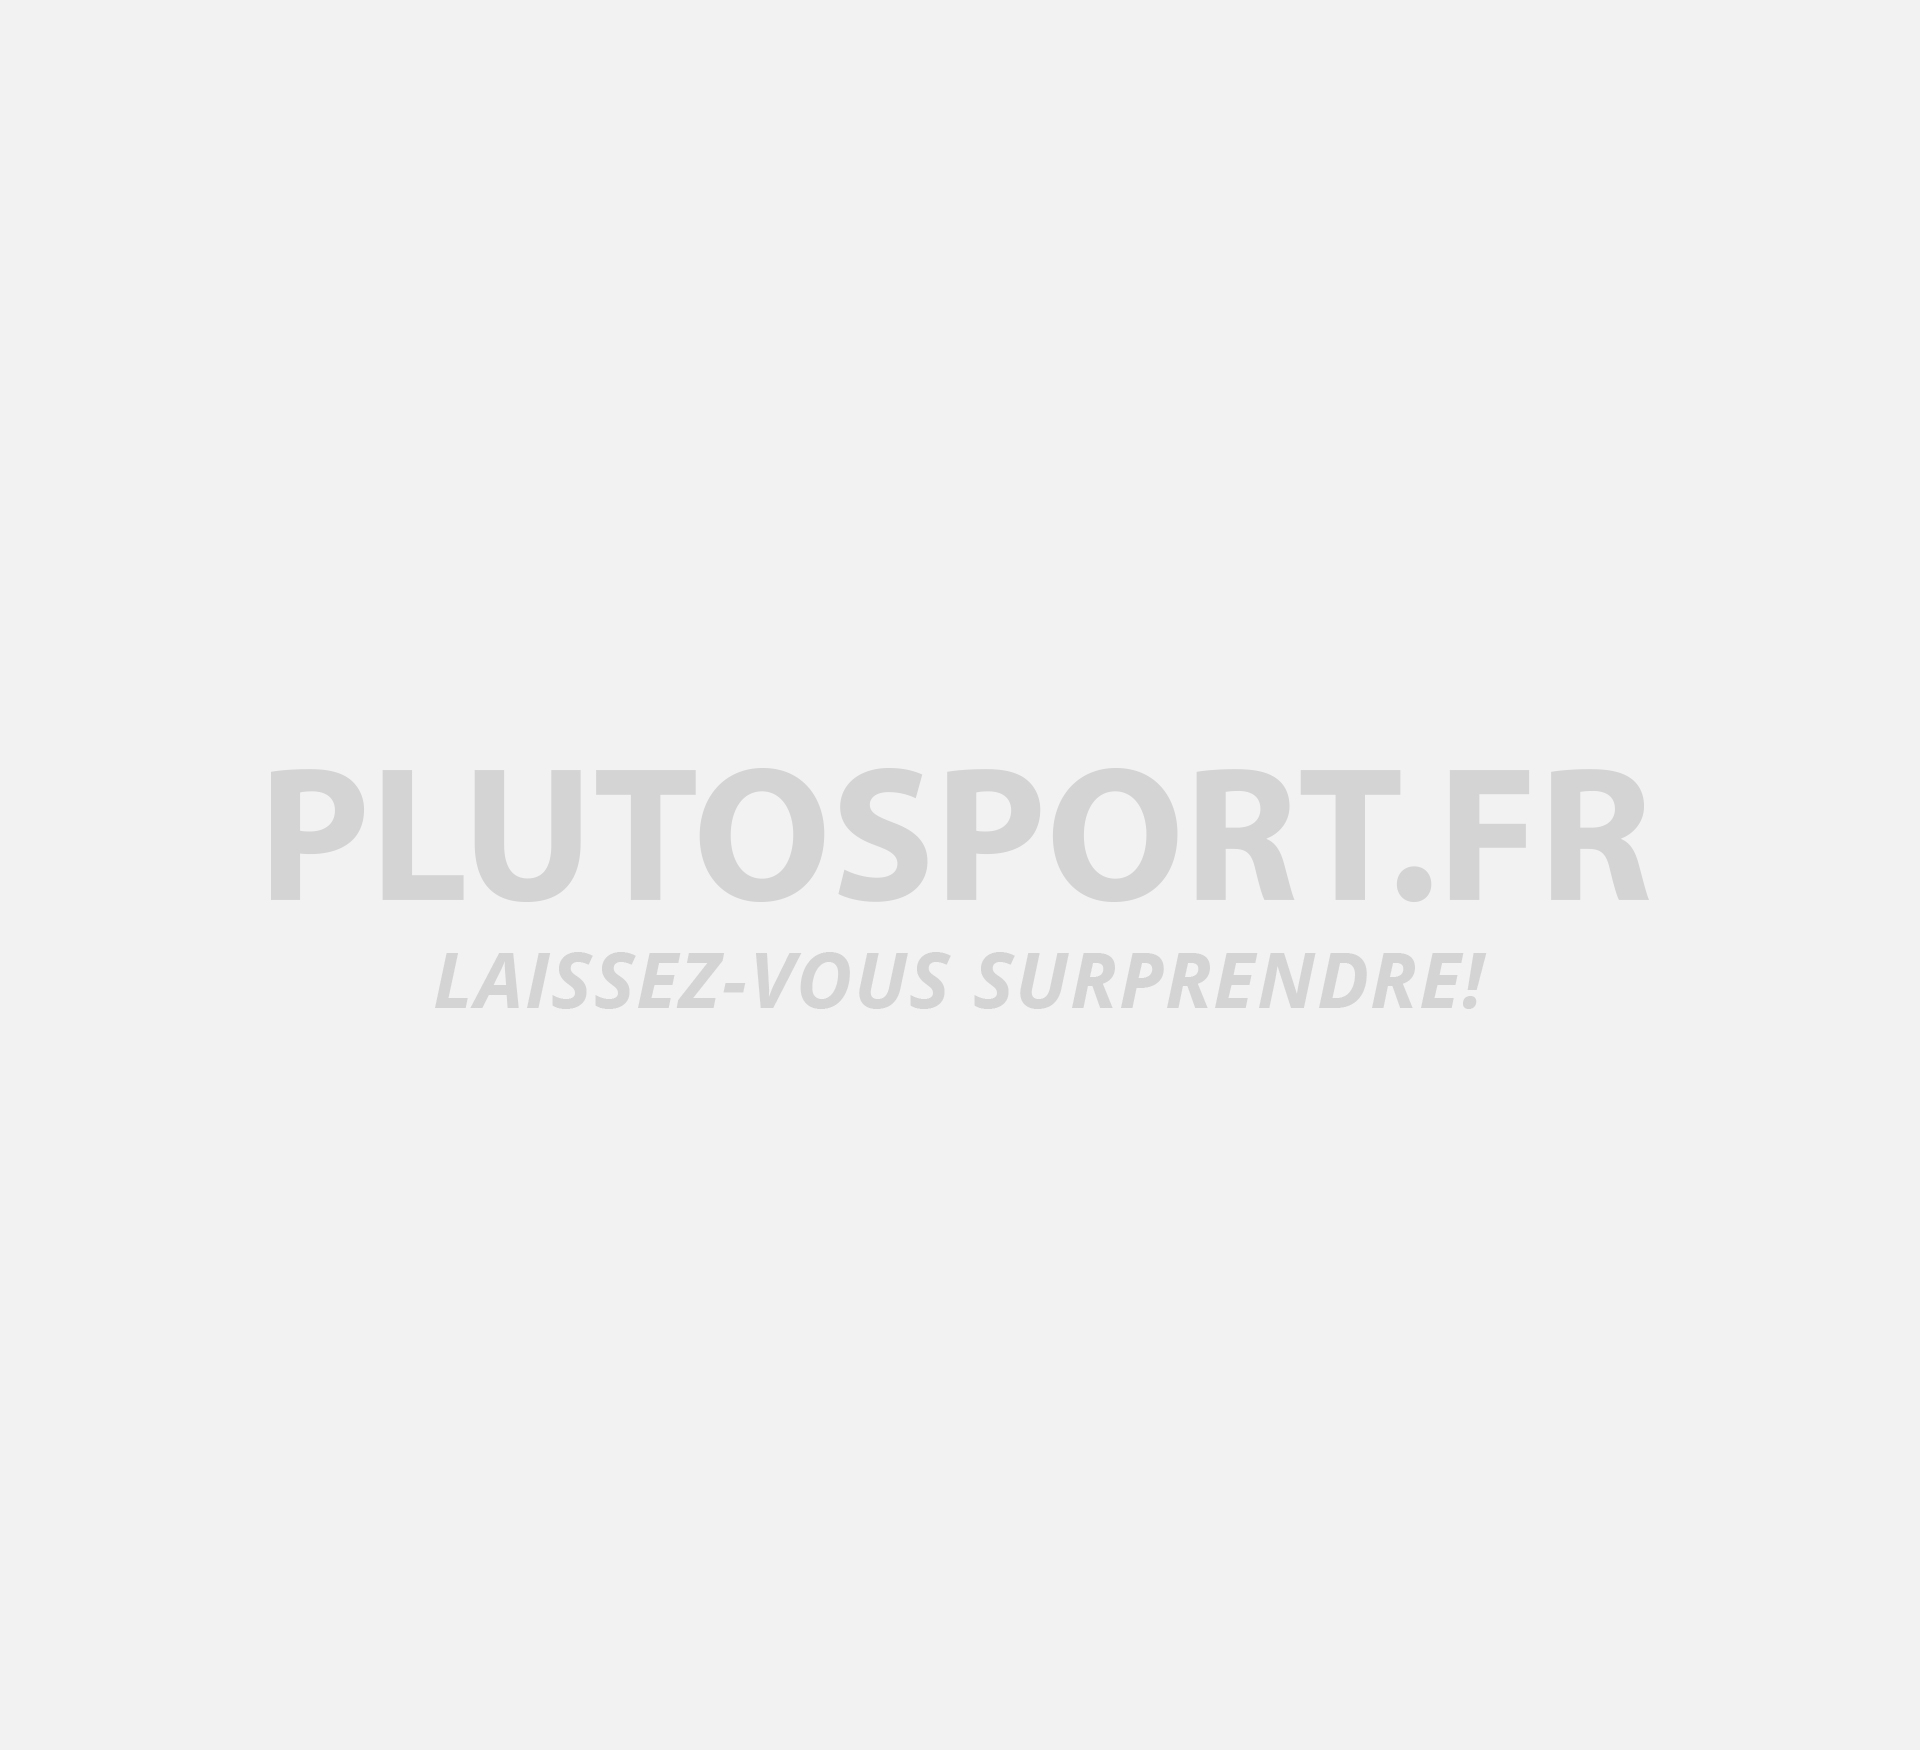 Soutien-gorge brassière Tommy Hilfiger Femme